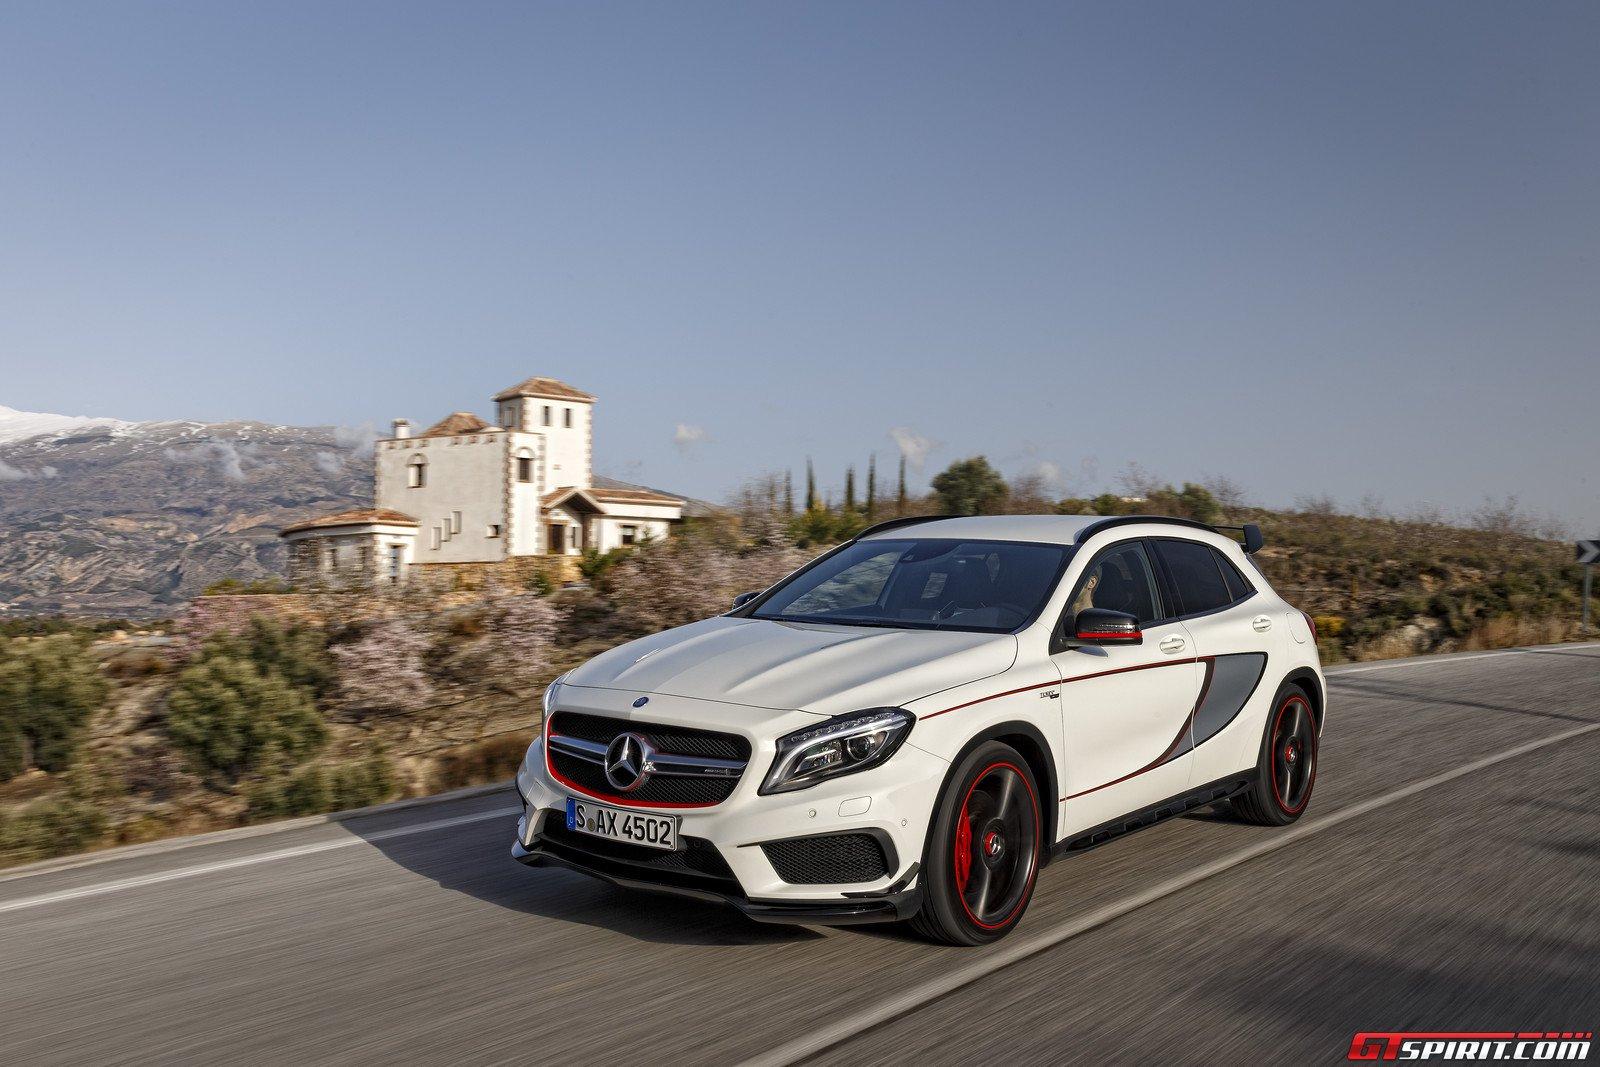 Super car mercedes benz gla 45 amg edition 1 for Mercedes benz 2015 gla